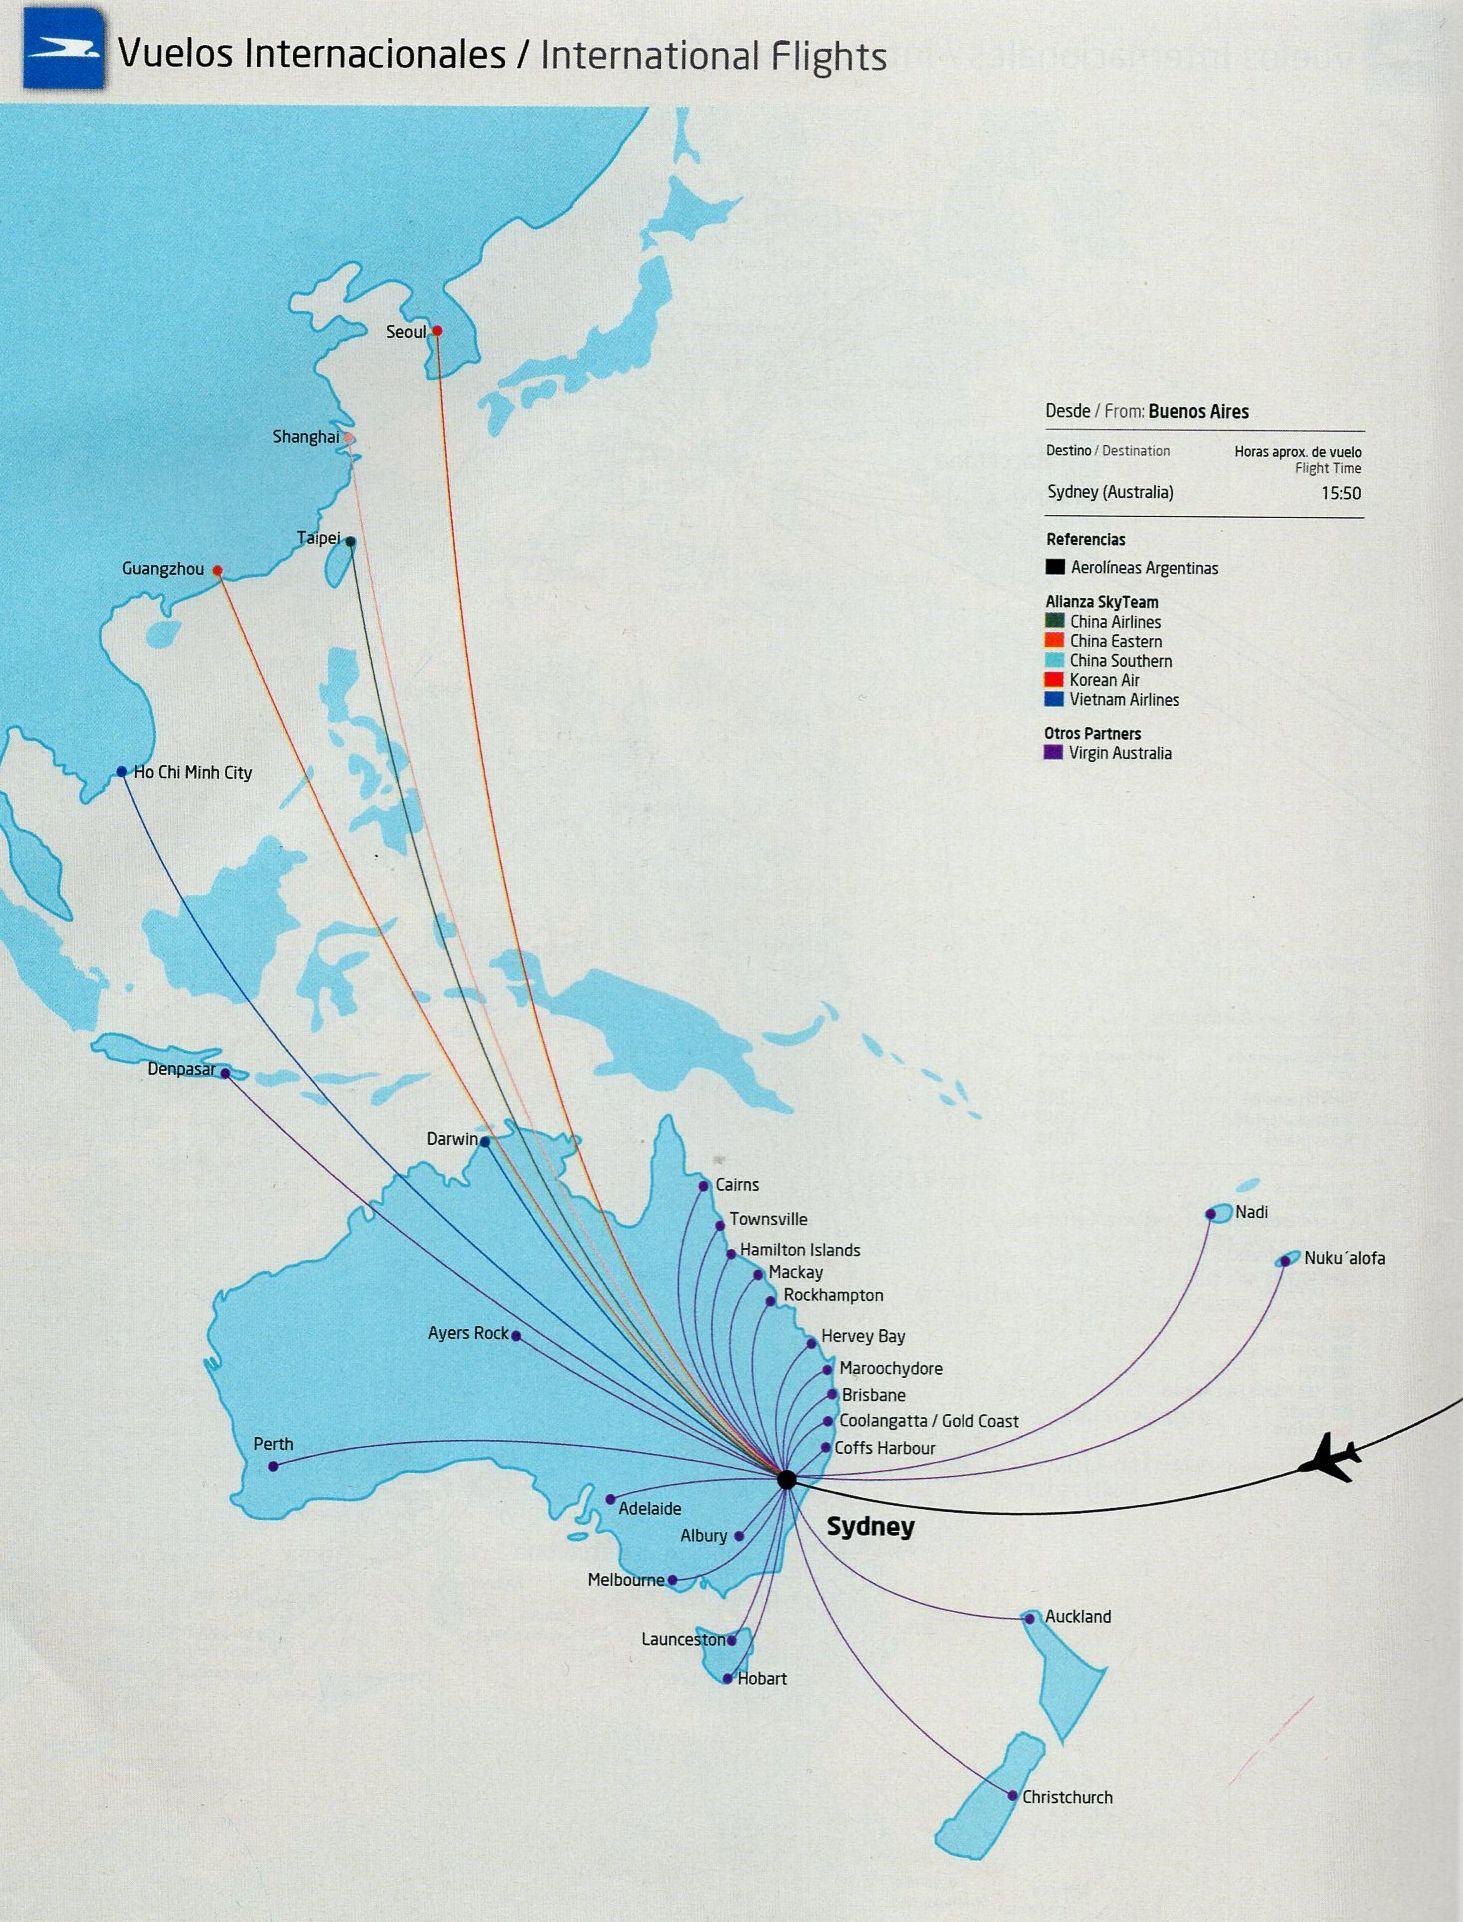 aerolineas argentinas route map Aerolineas Argentinas 2013 Asia Pacific Routemap Route Map aerolineas argentinas route map